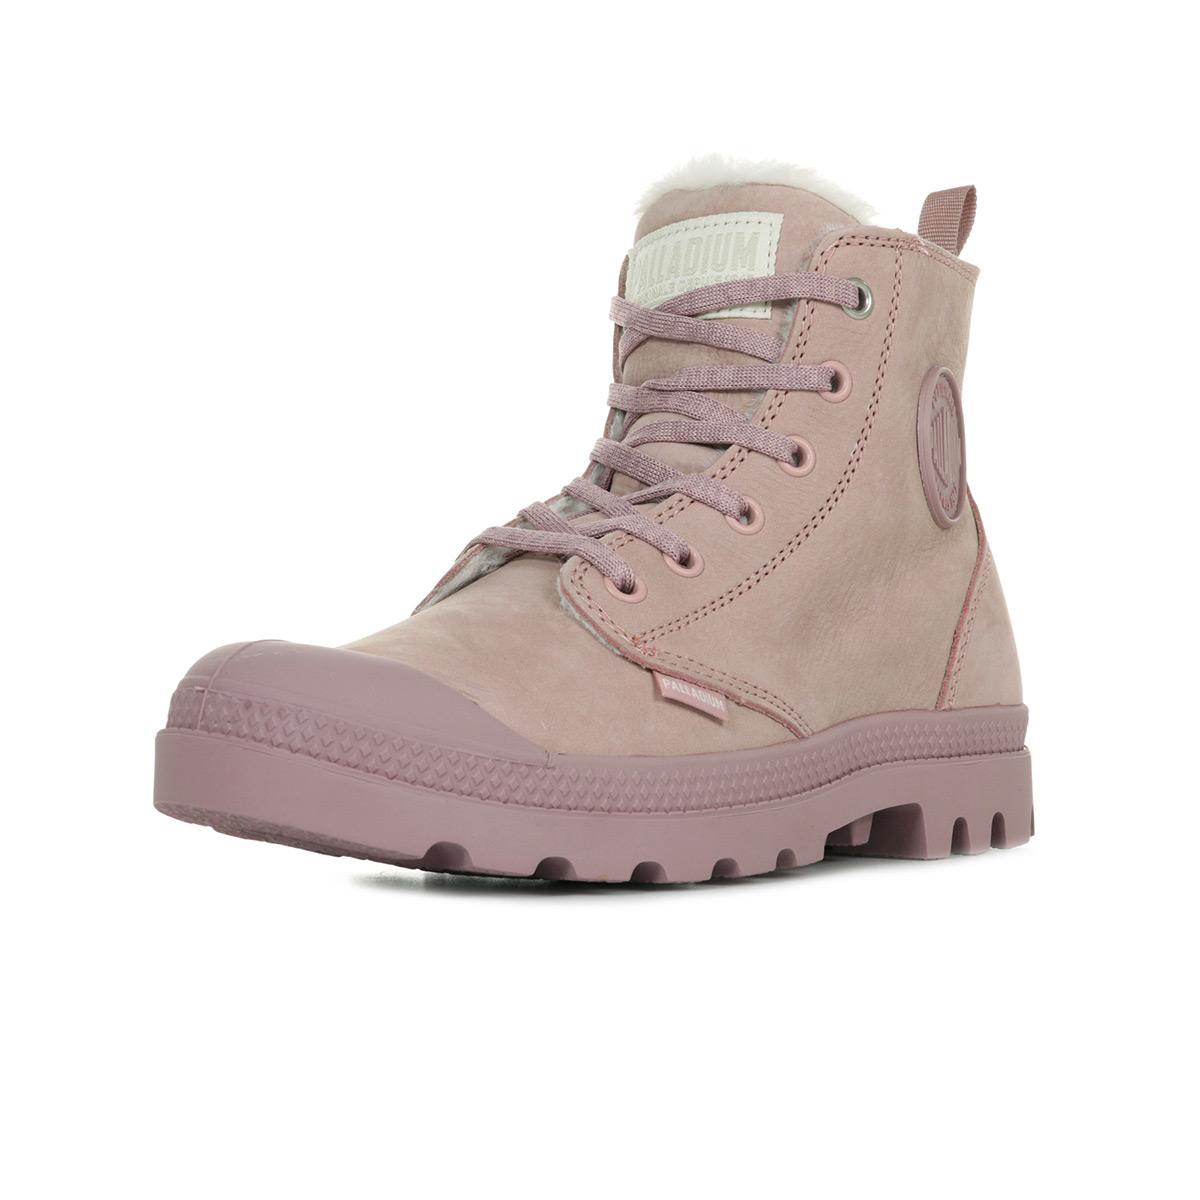 Wl Dust Boots Femme Fawn Pampa Palladium 75519p98 Rose Hi Zip q44wtg